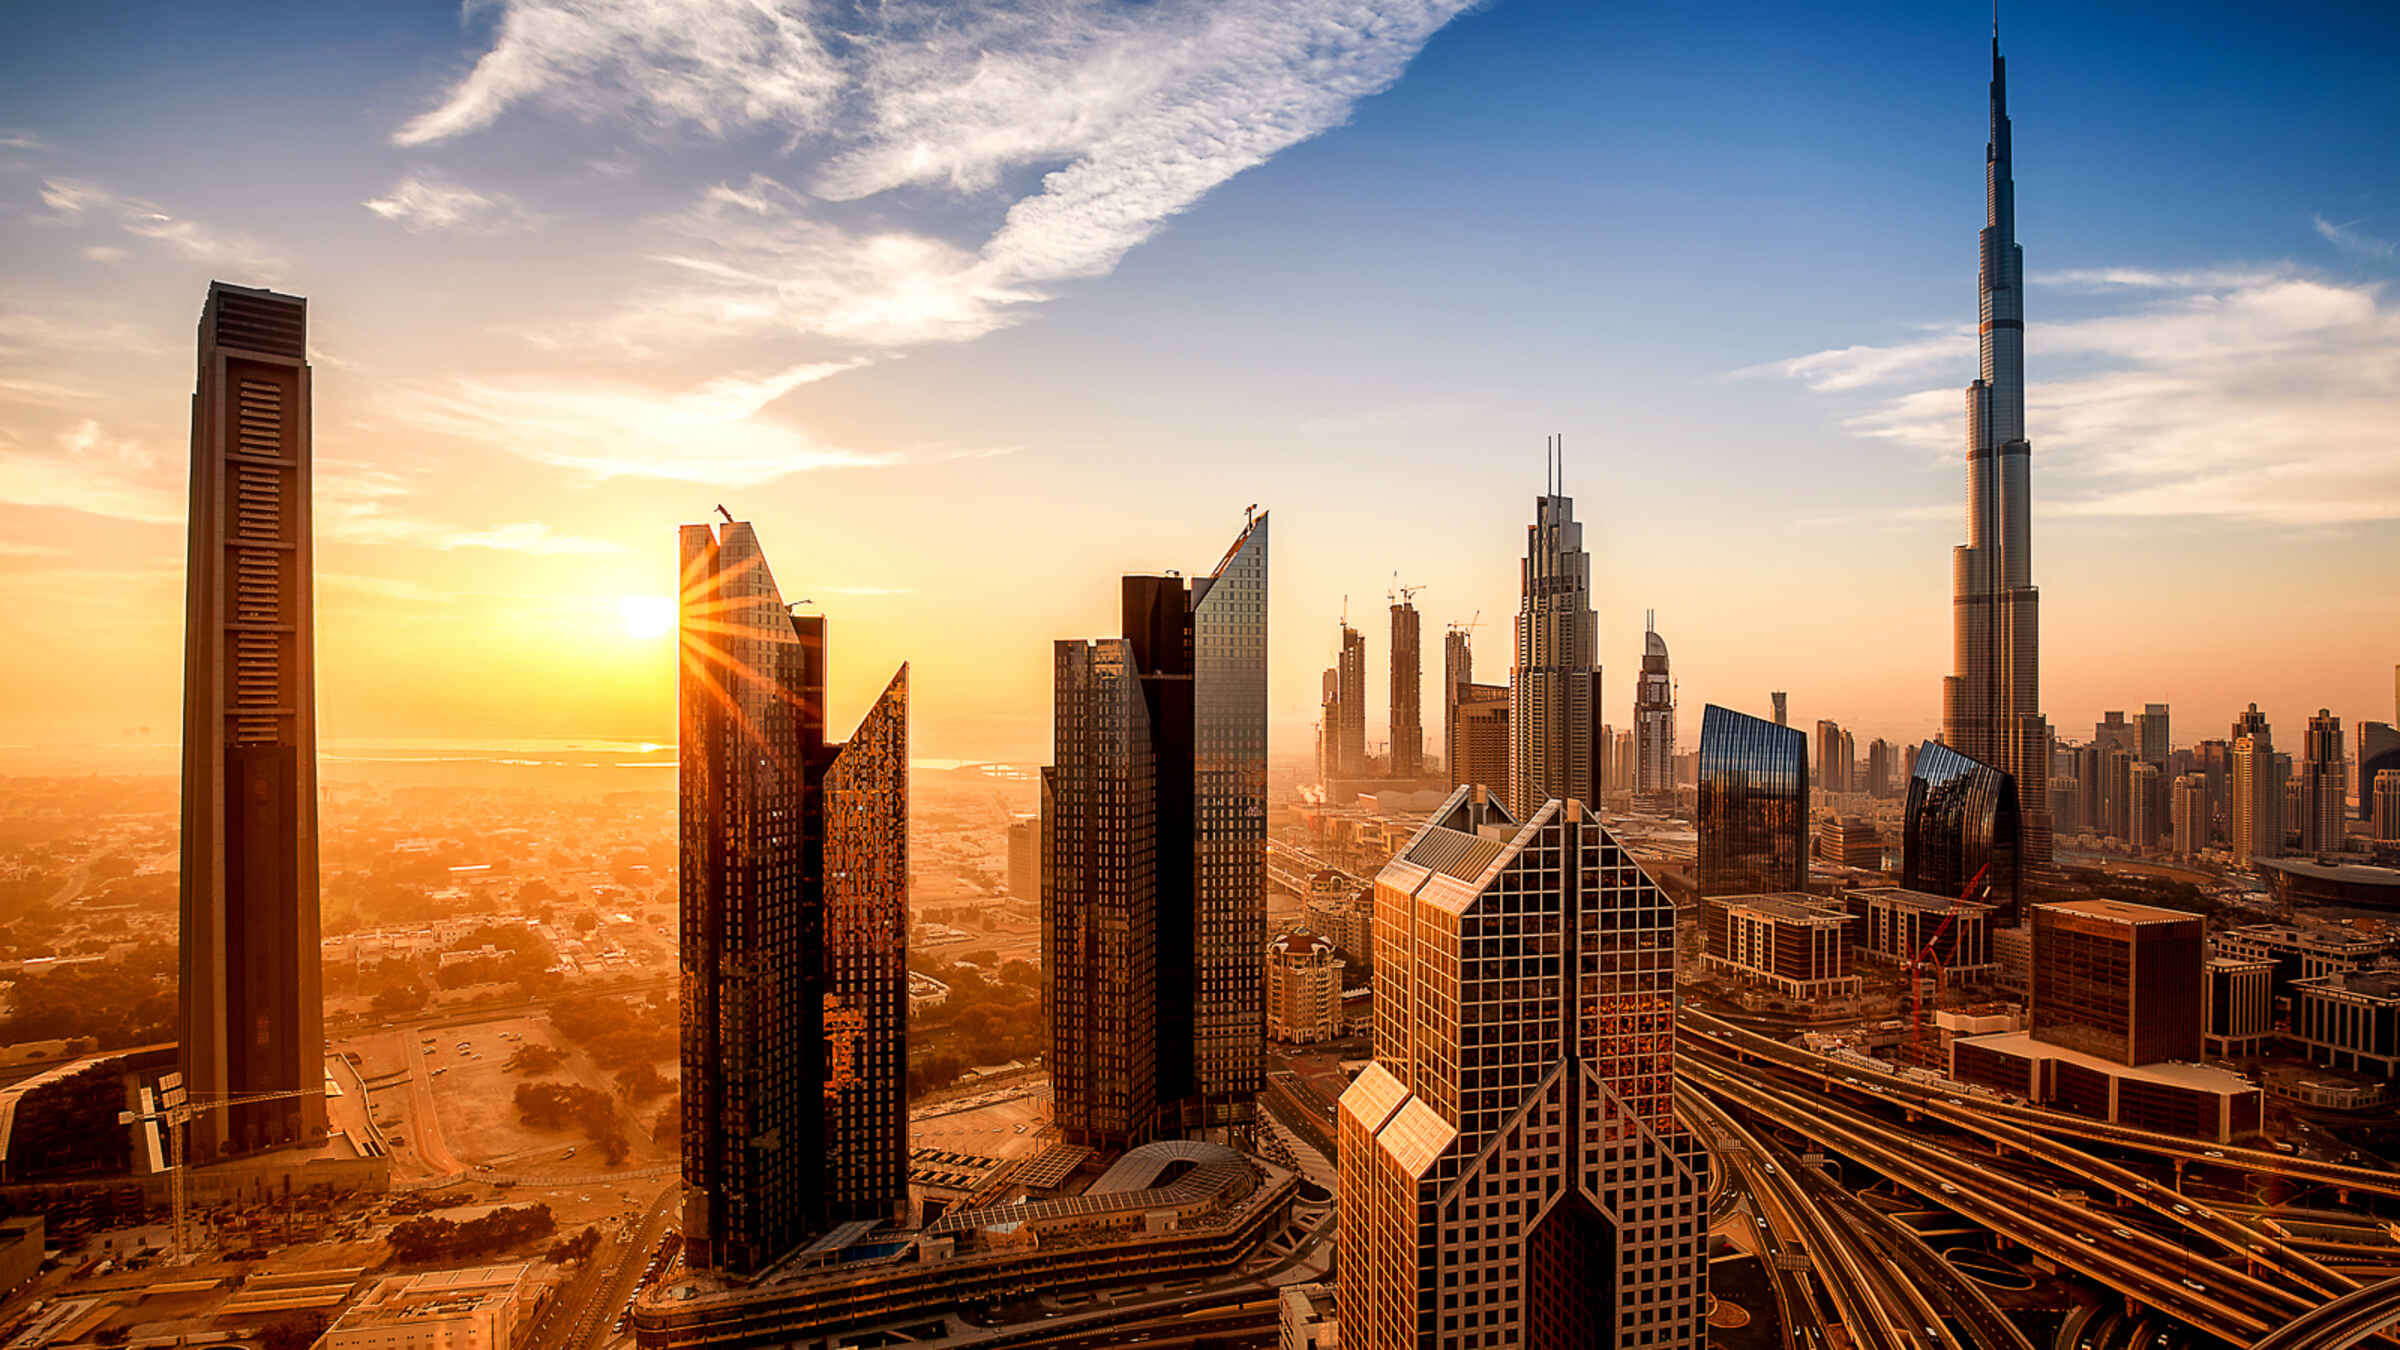 Top 10 Events of Dubai Having International Image or Status